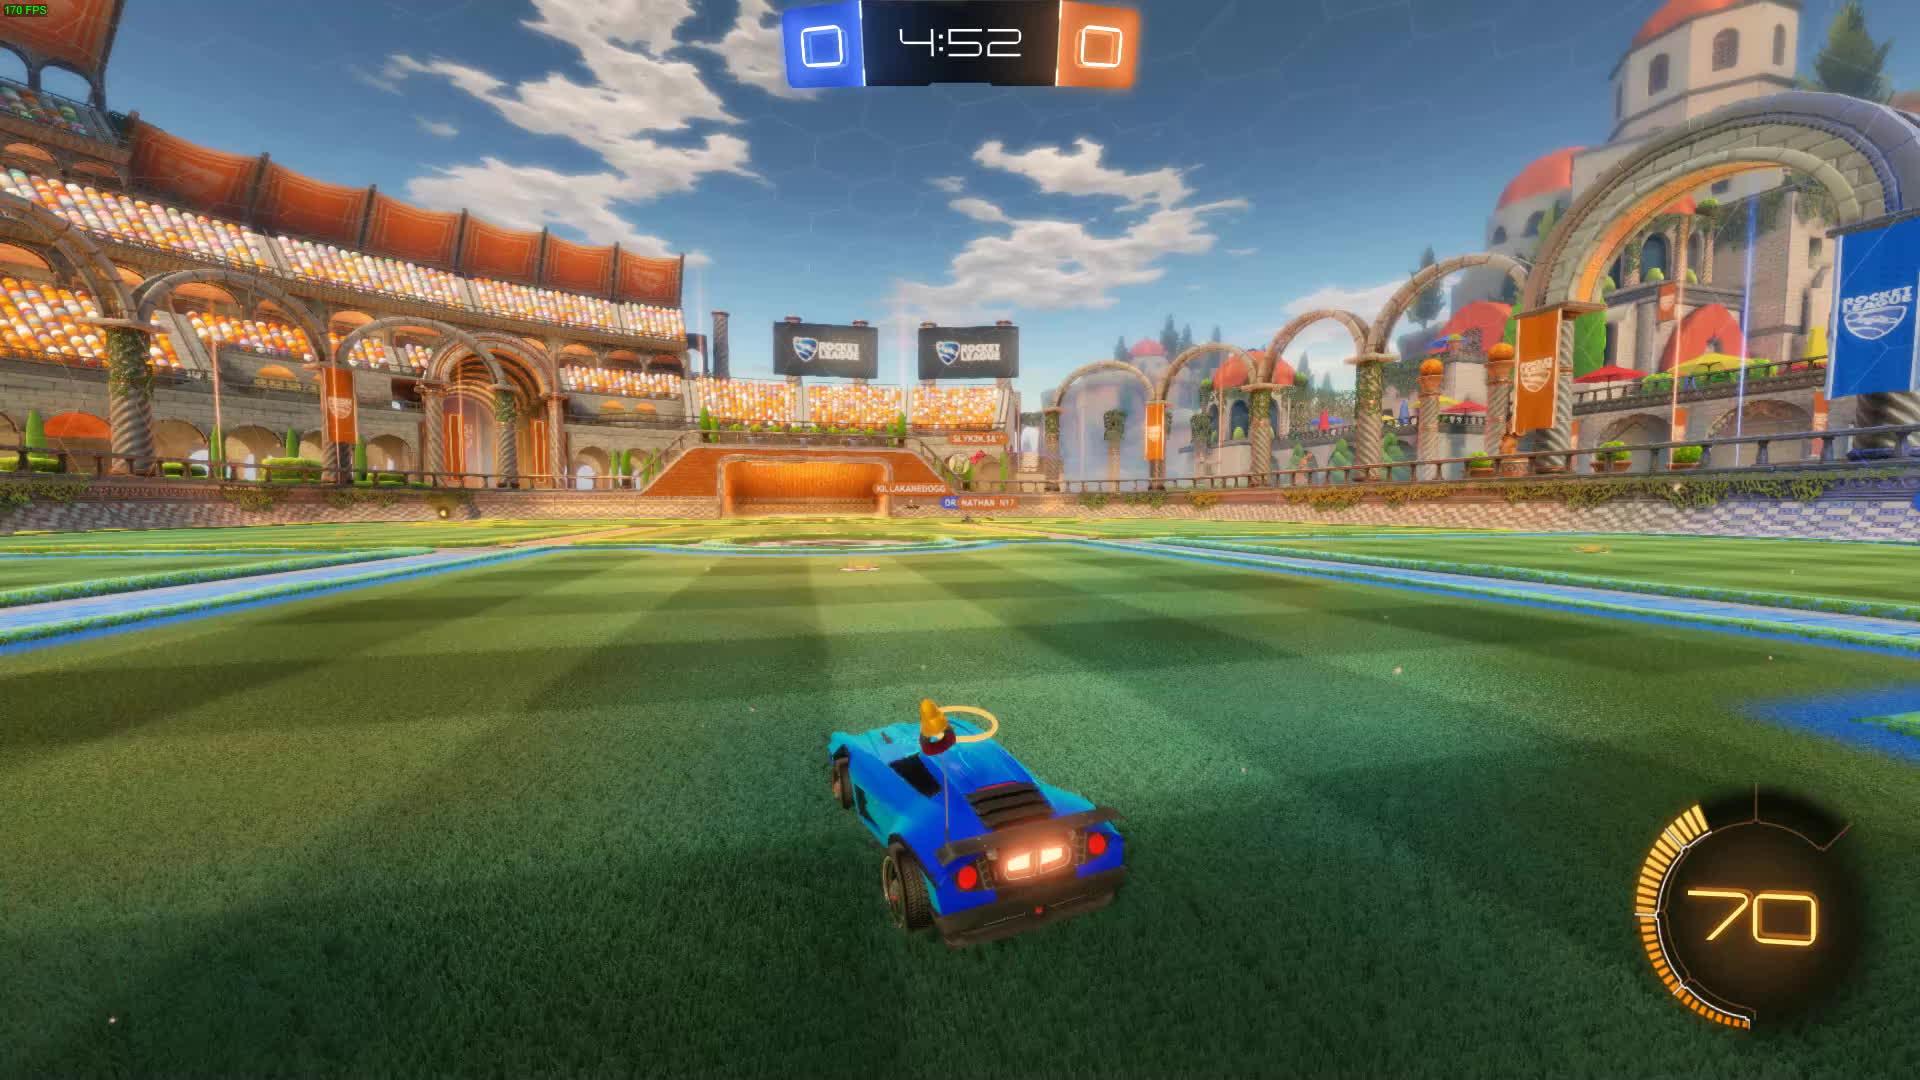 Rocket League, rocketleague, 3s aerial GIFs